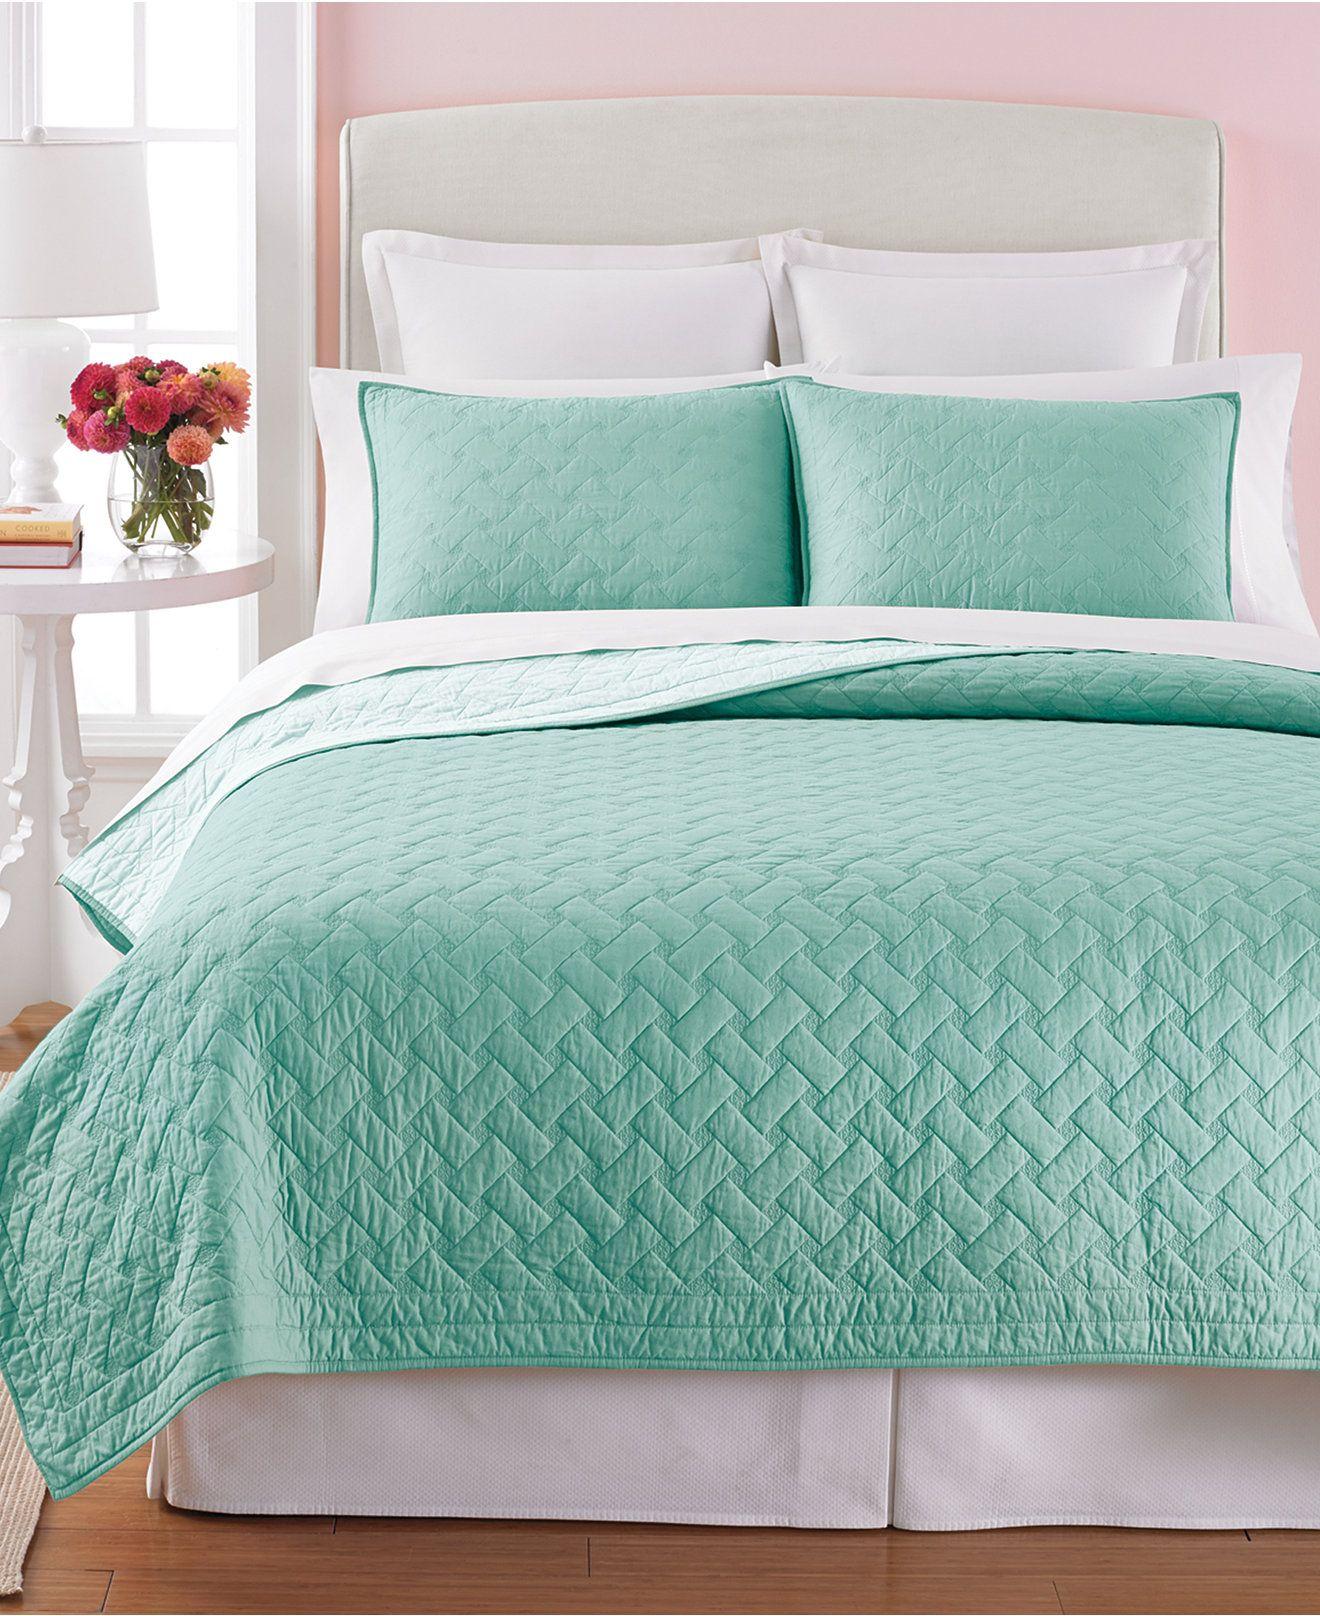 Martha Stewart Collection Basket Stitch Full/Queen Quilt (Aqua ... : macys bedding quilts - Adamdwight.com